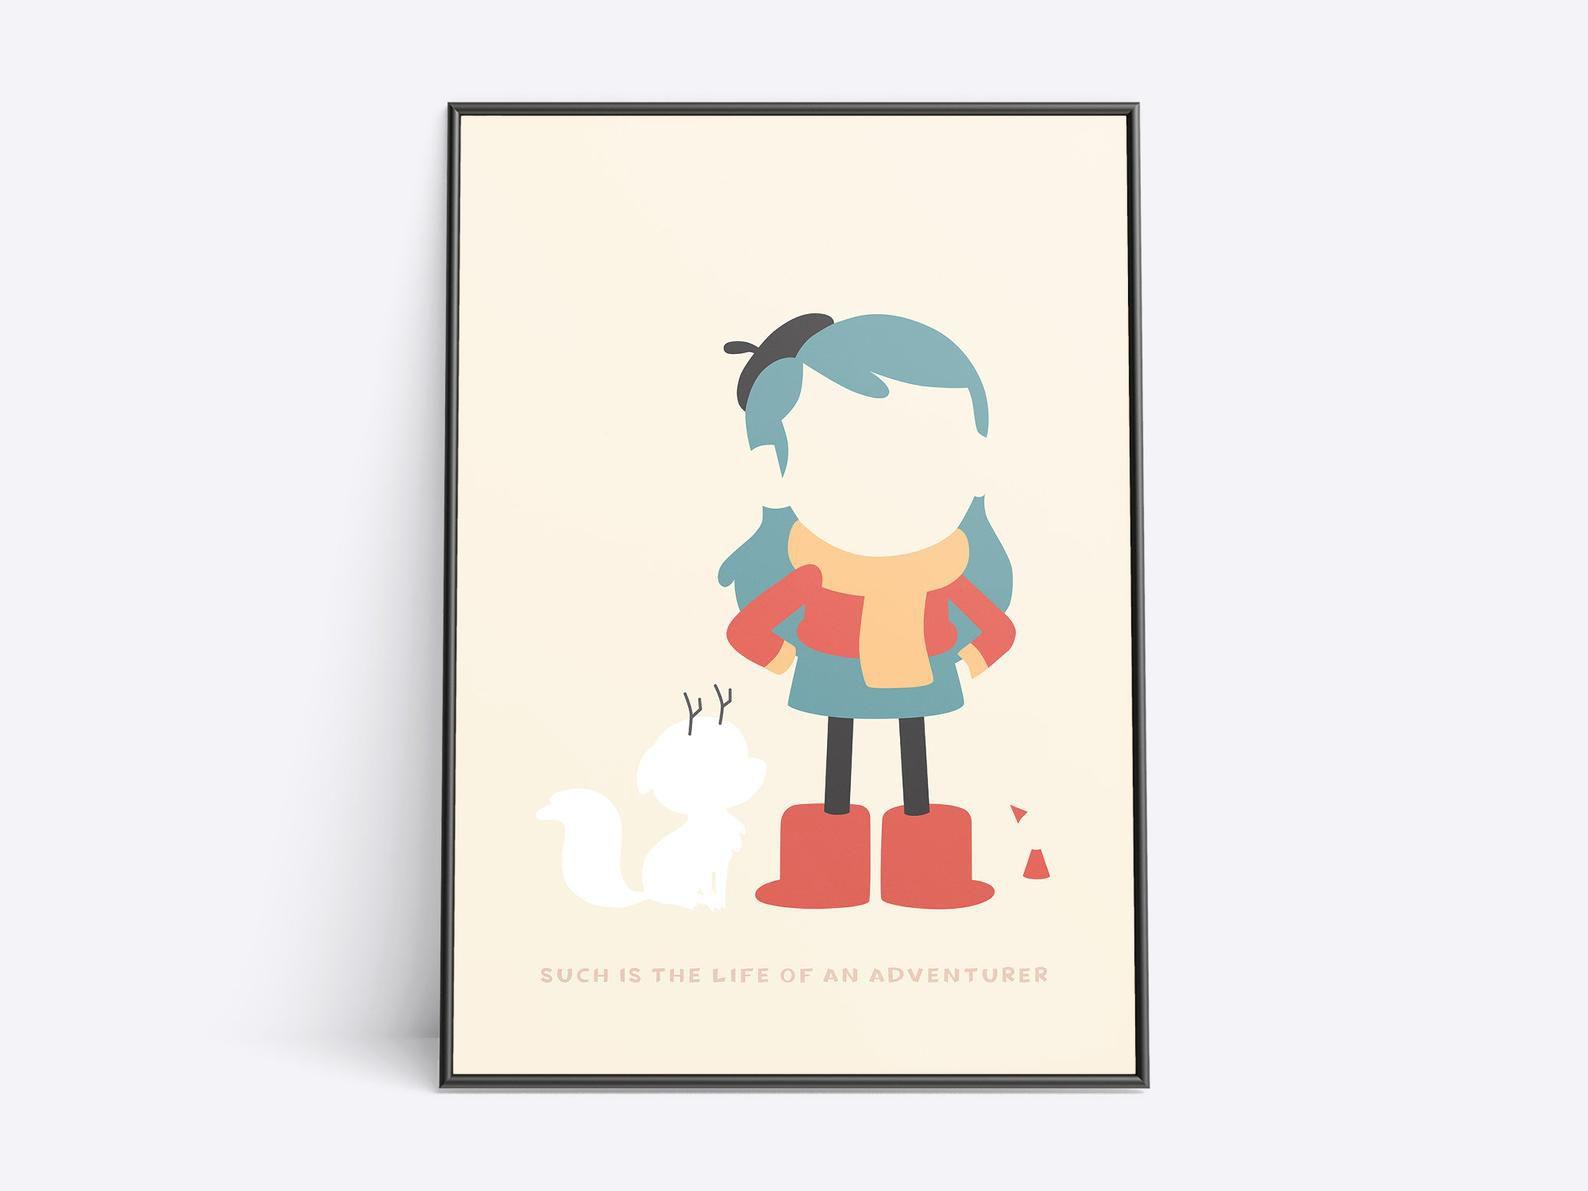 Hilda art print in minimalist style